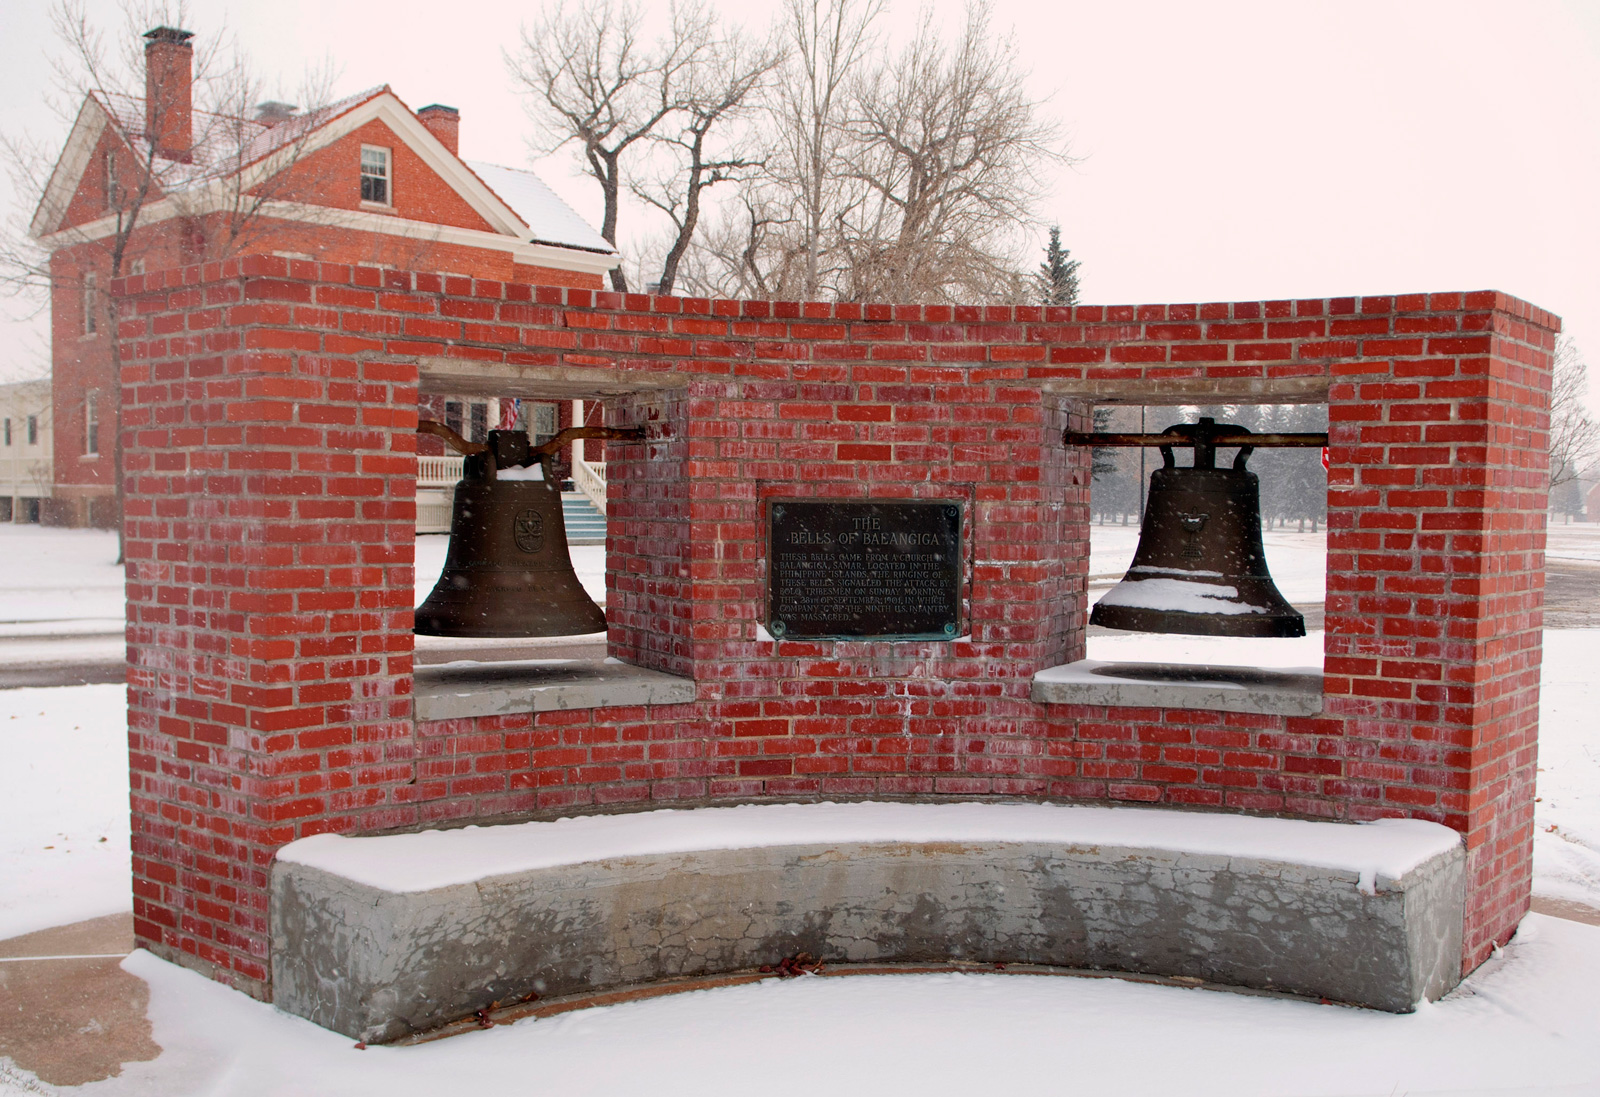 The Bells of Balangiga